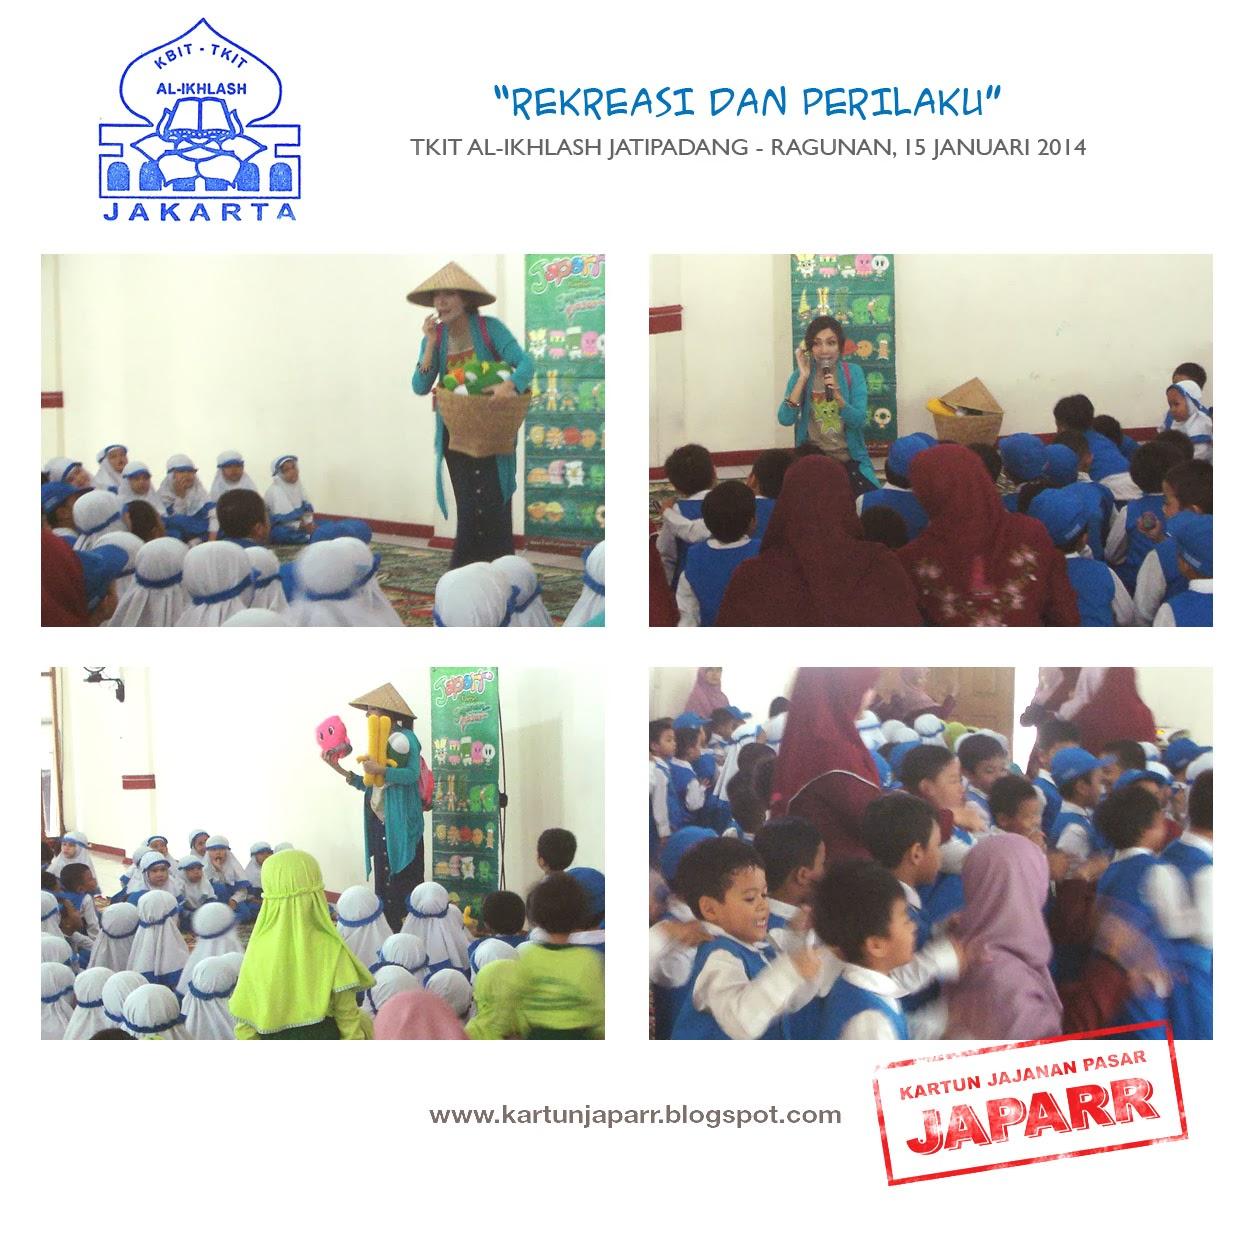 Rekreasi dan Perilaku' @ TKIT Al - Ikhlash Jatipadang